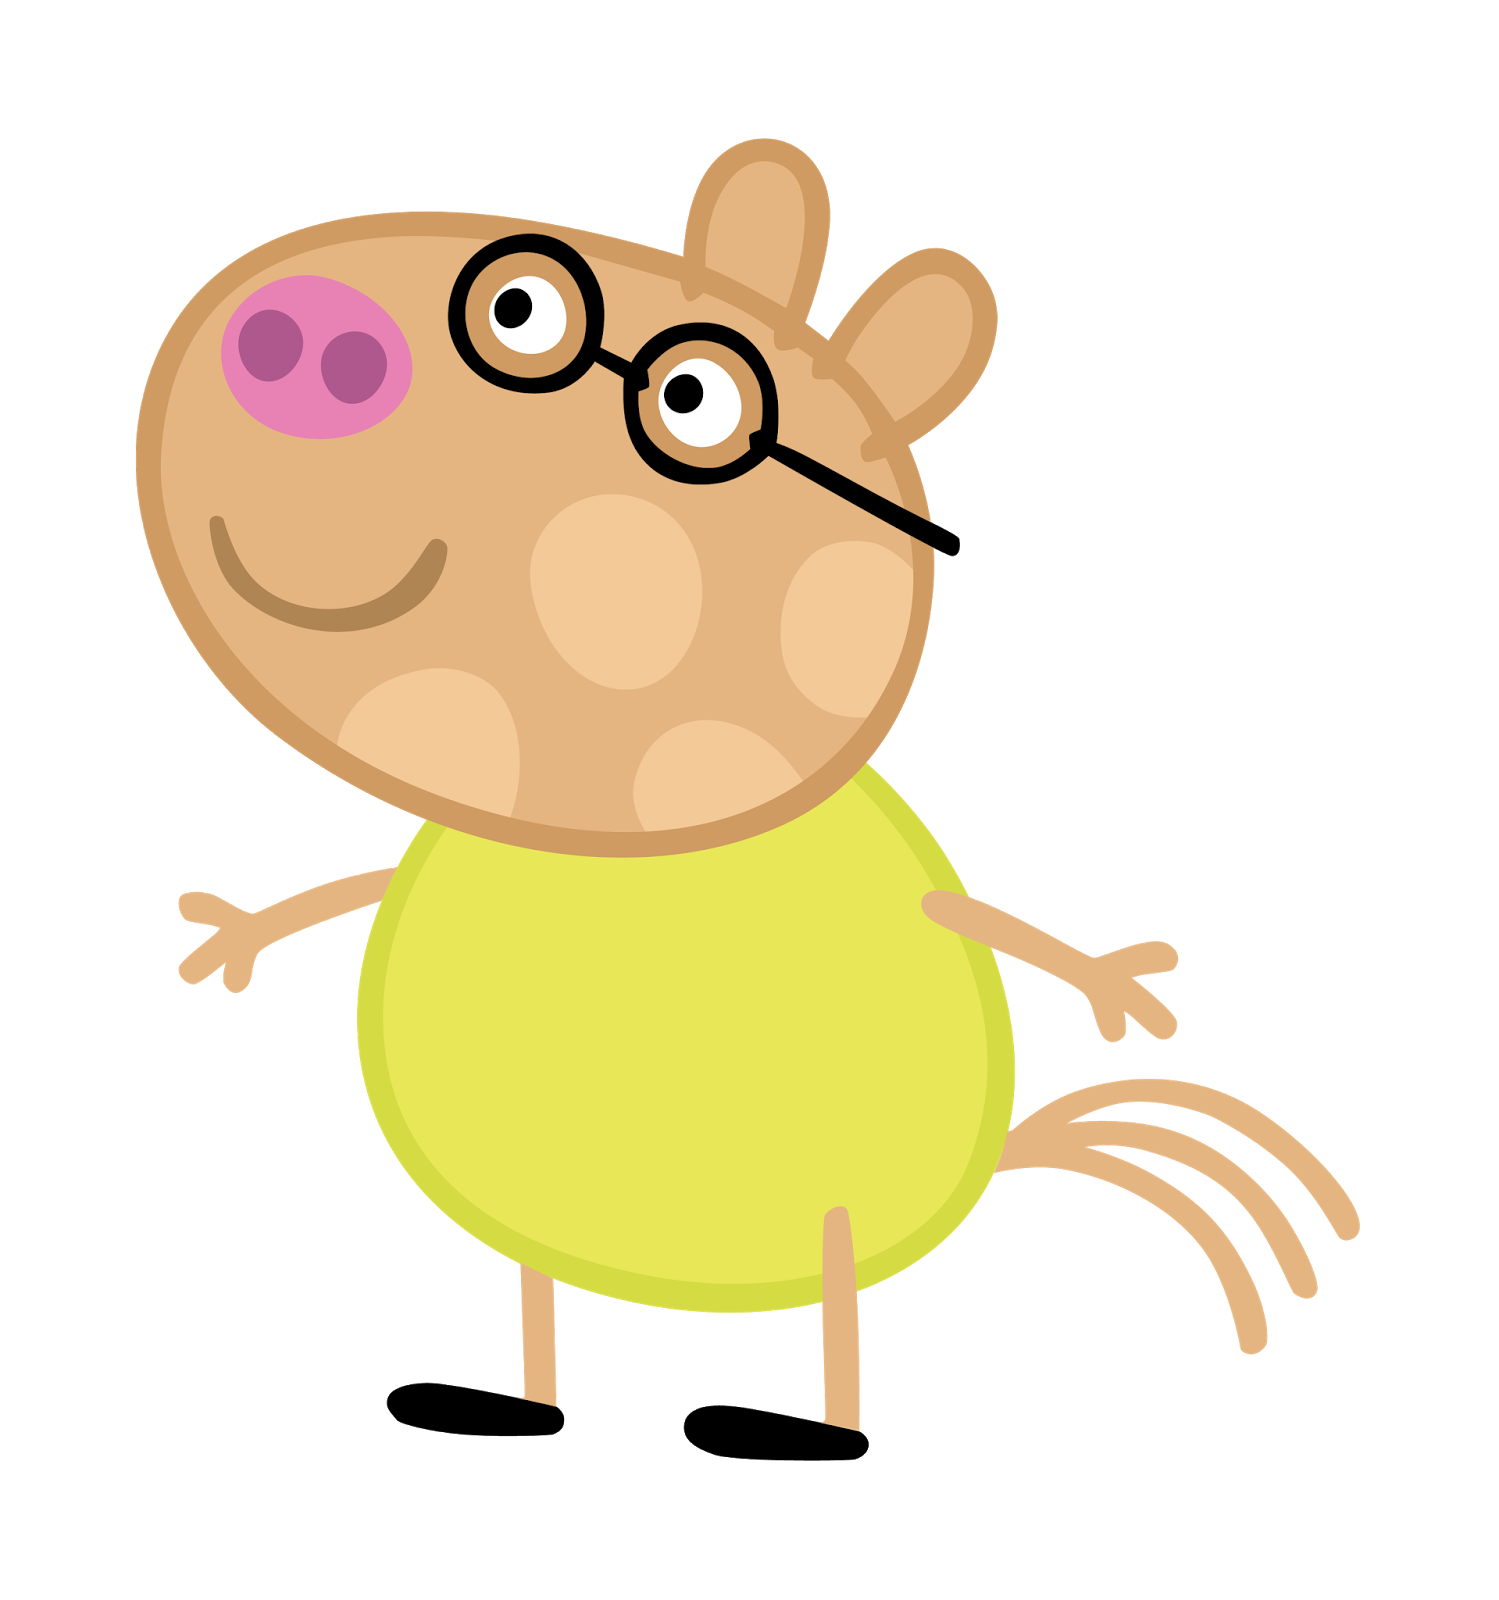 Cartoon Characters Peppa Pig Png Hq Pig Character Peppa Pig Peppa Pig Birthday Party